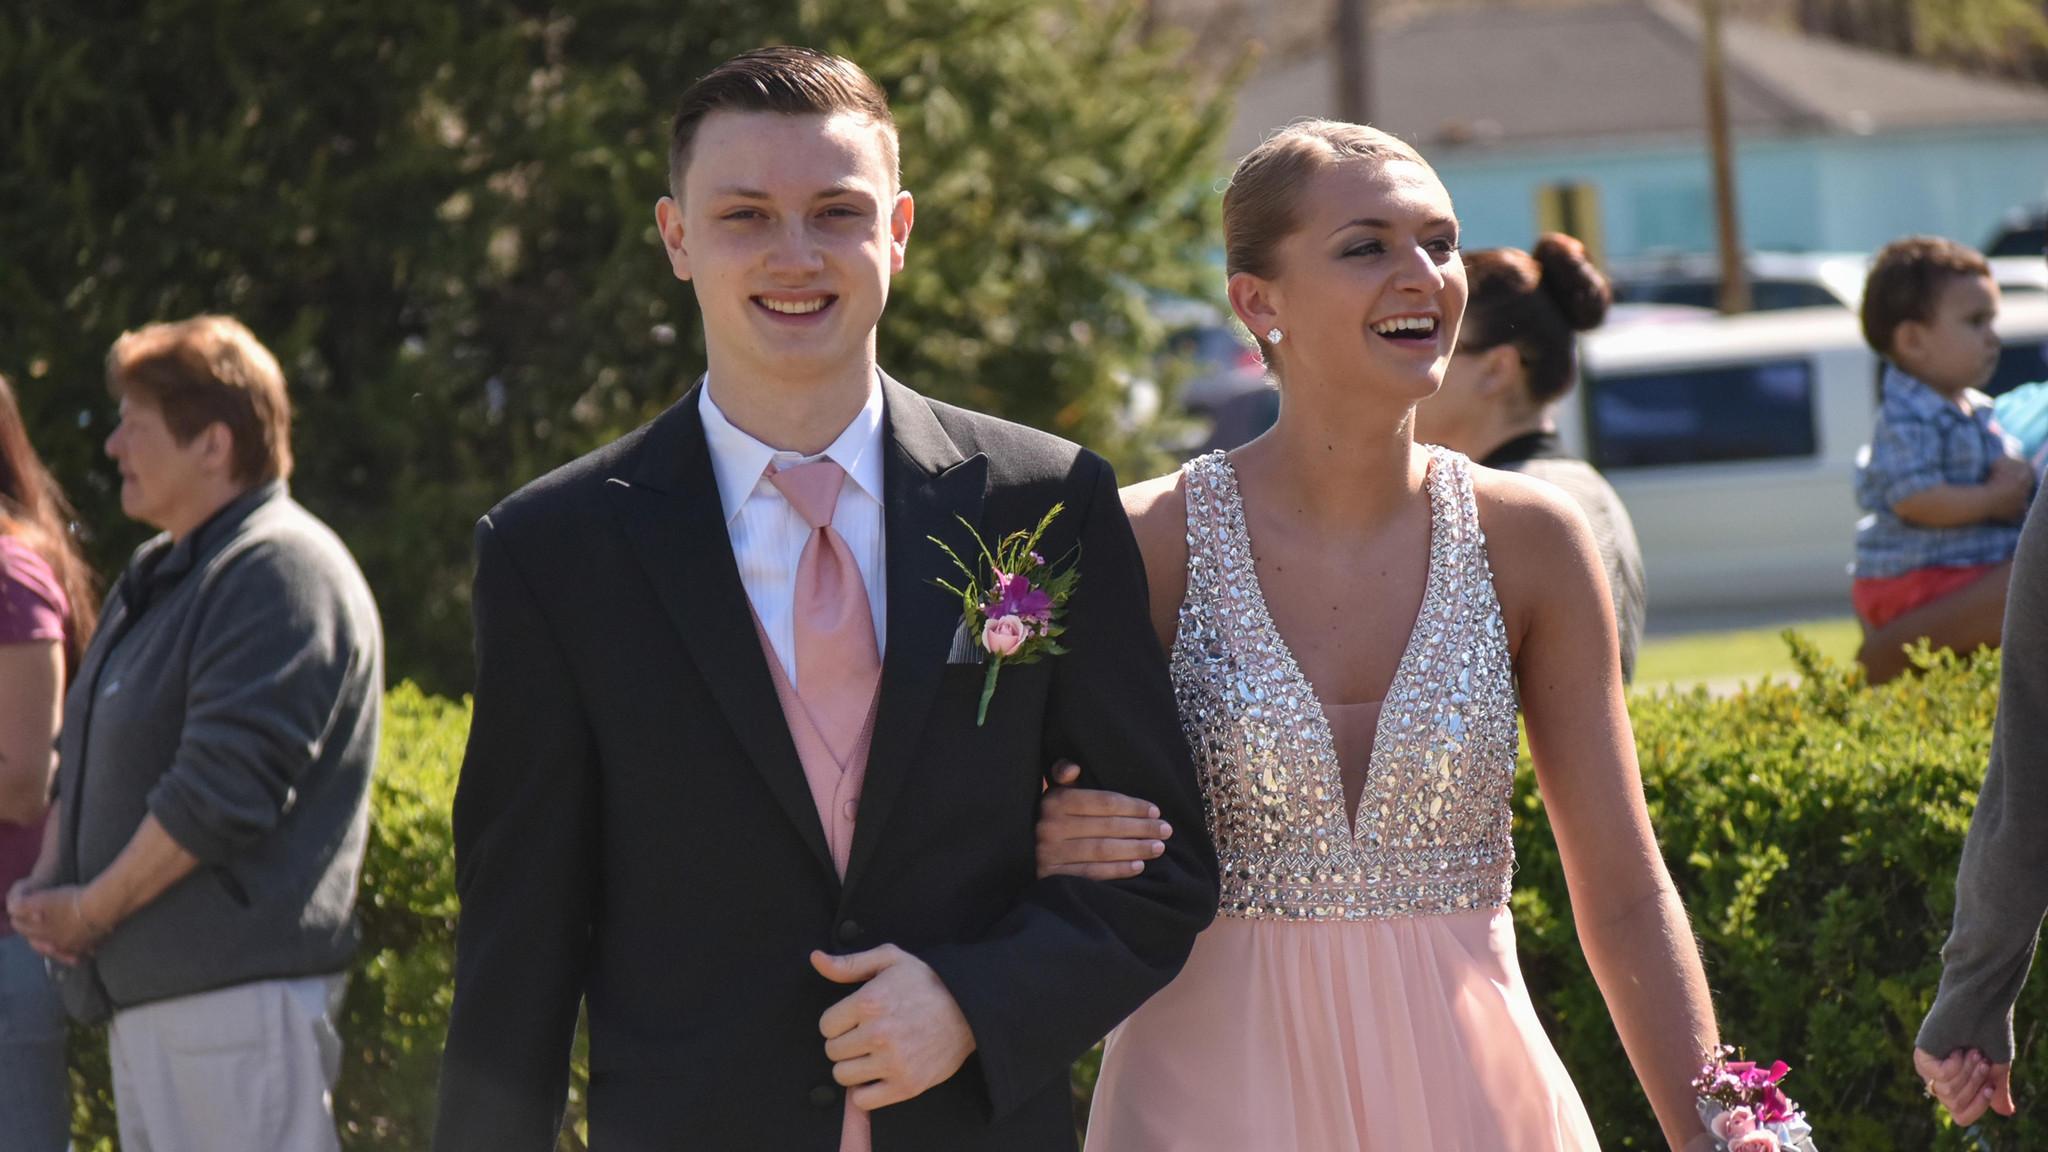 At prom